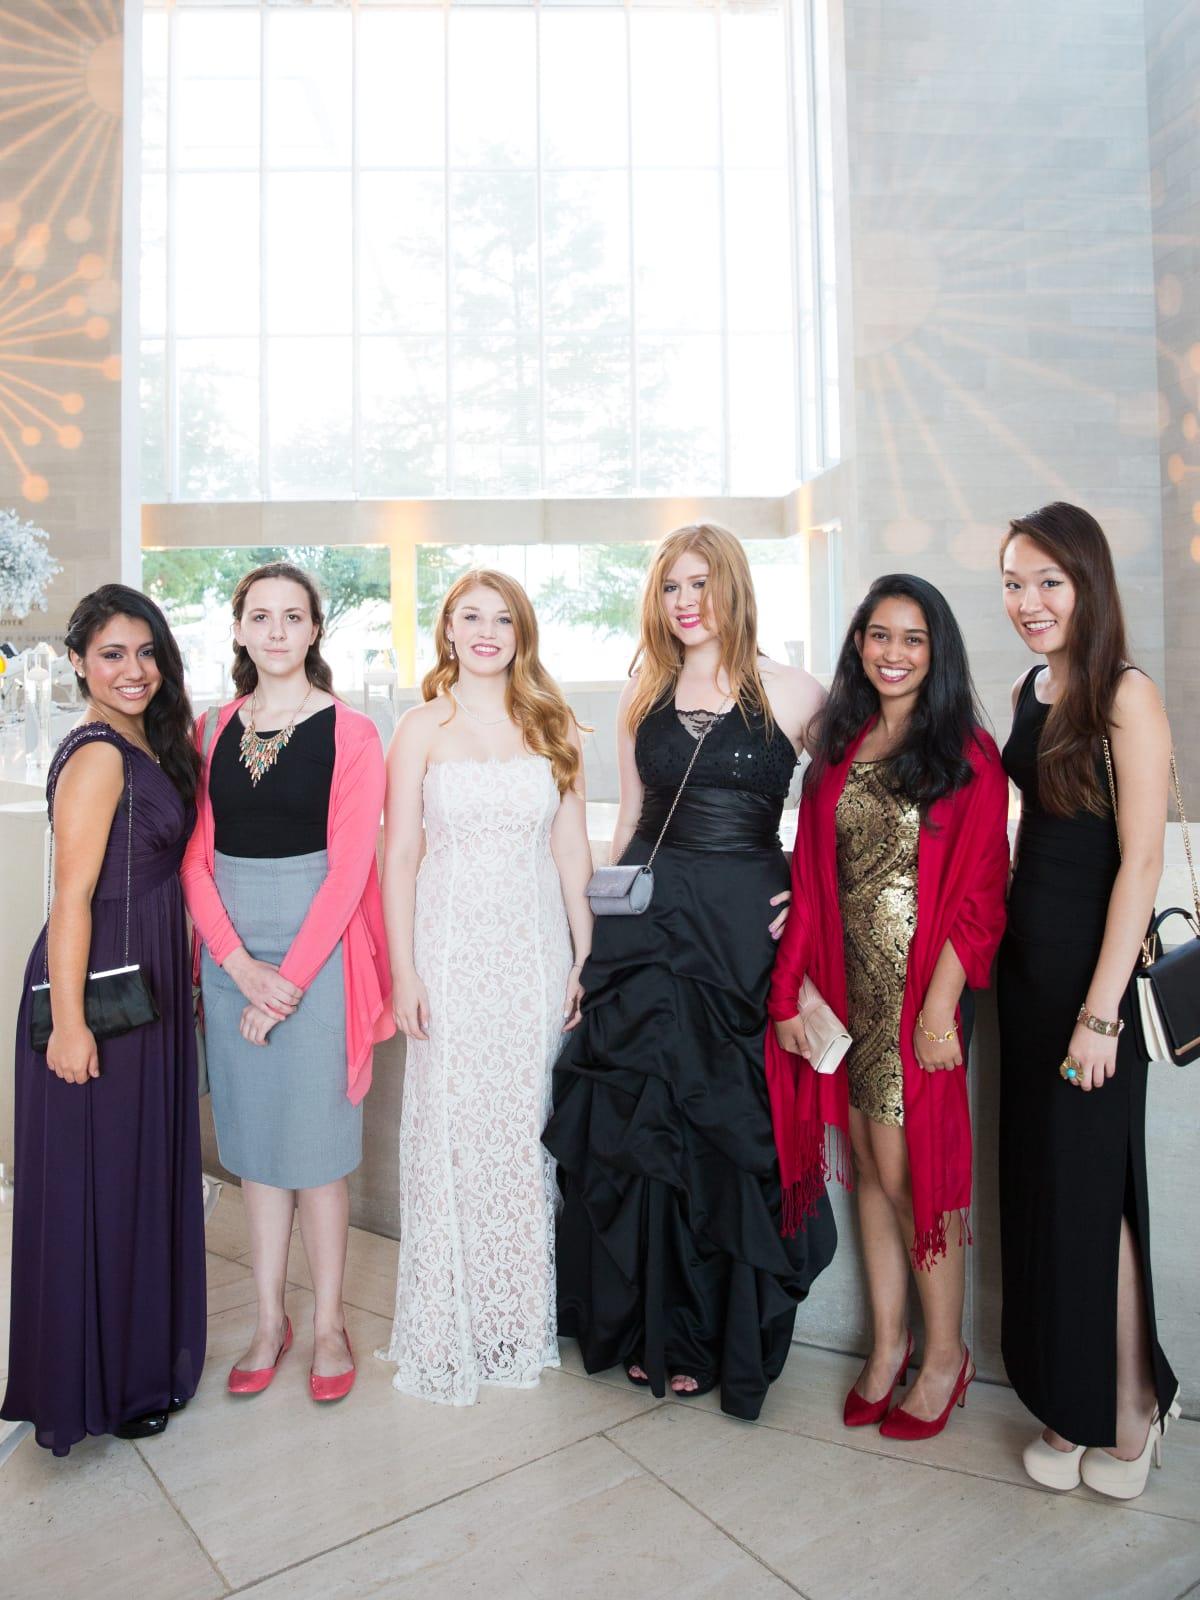 Molly Martinez, Samantha Miller, Jessica Ehling, Abby Crouse, Nivedina Sarma, Hadassah Lai